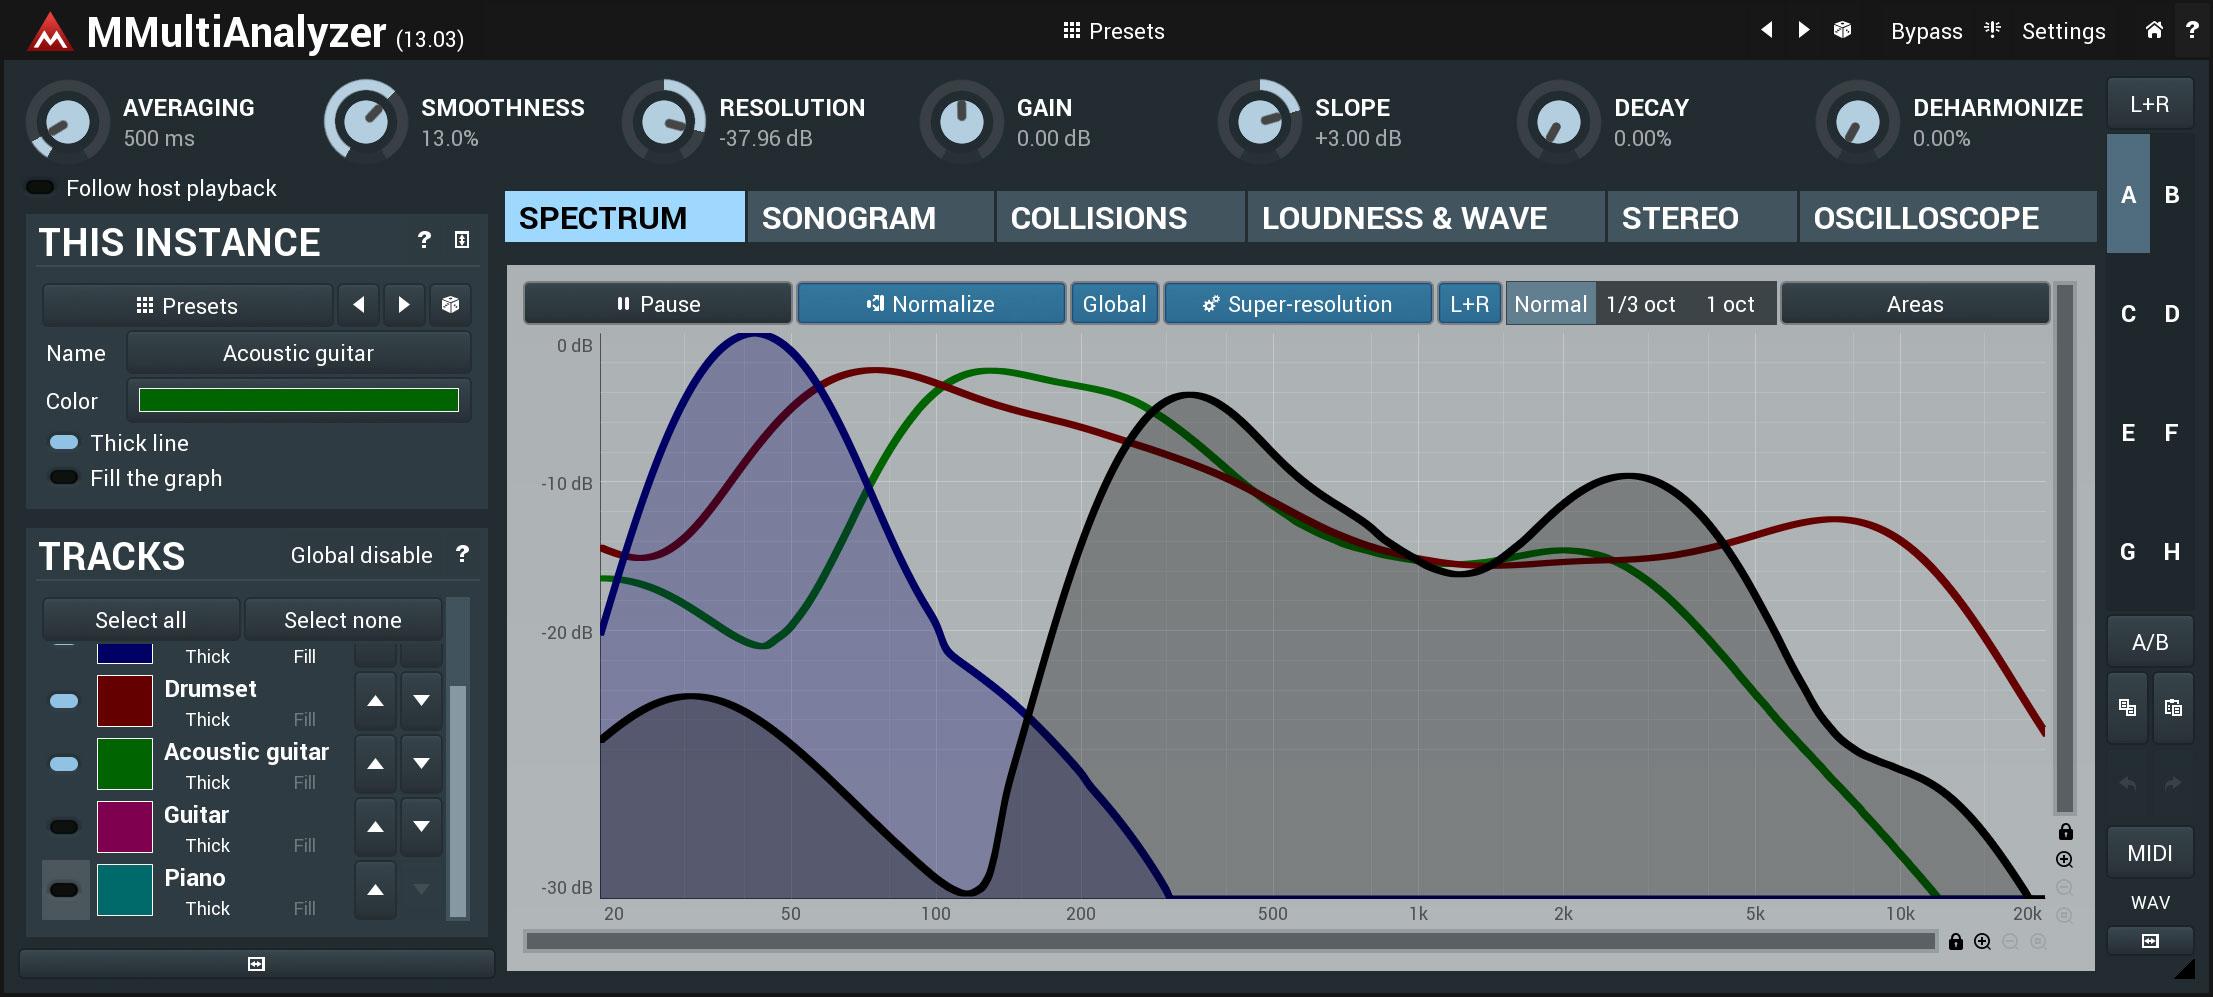 KVR: MMultiAnalyzer by MeldaProduction - Audio Analysis Tool